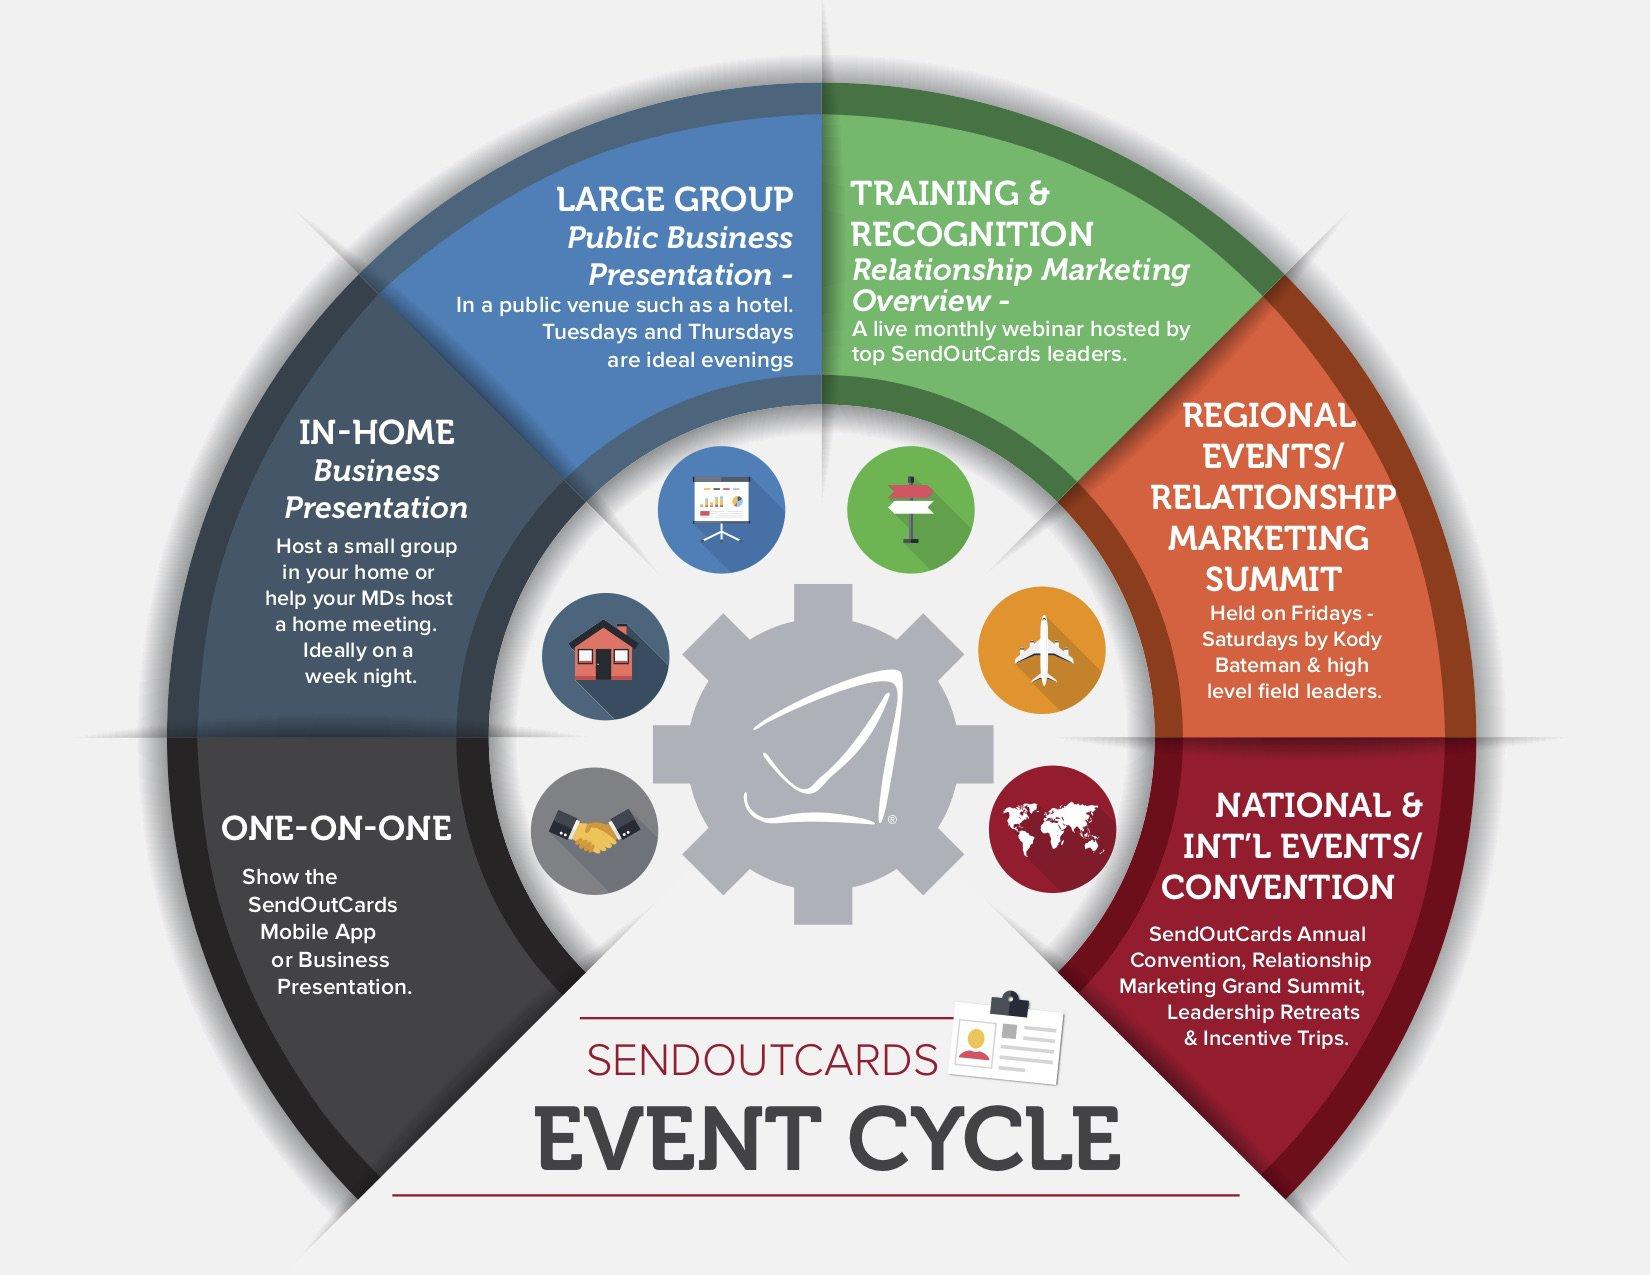 EventCycle